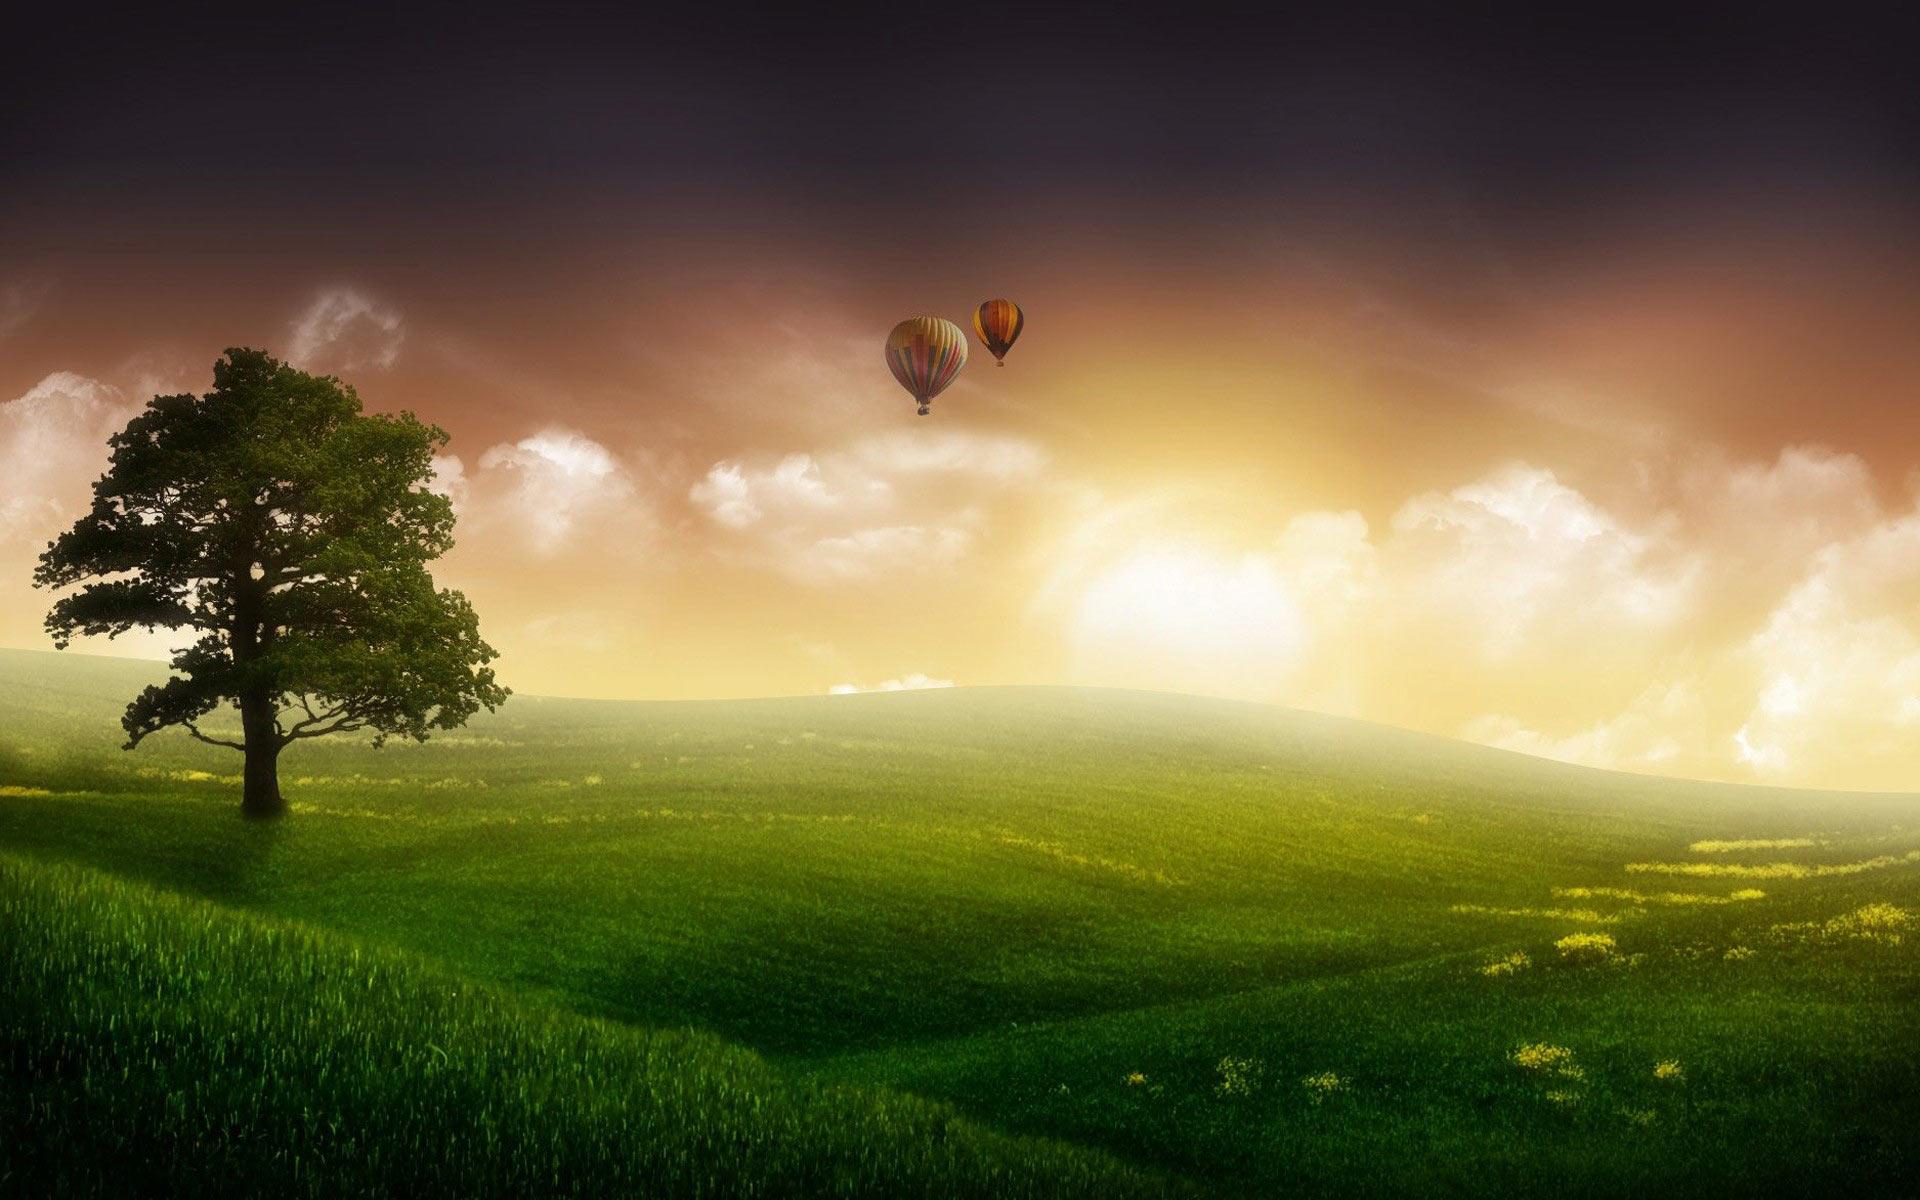 Free Background Desktop Images - WallpaperSafari